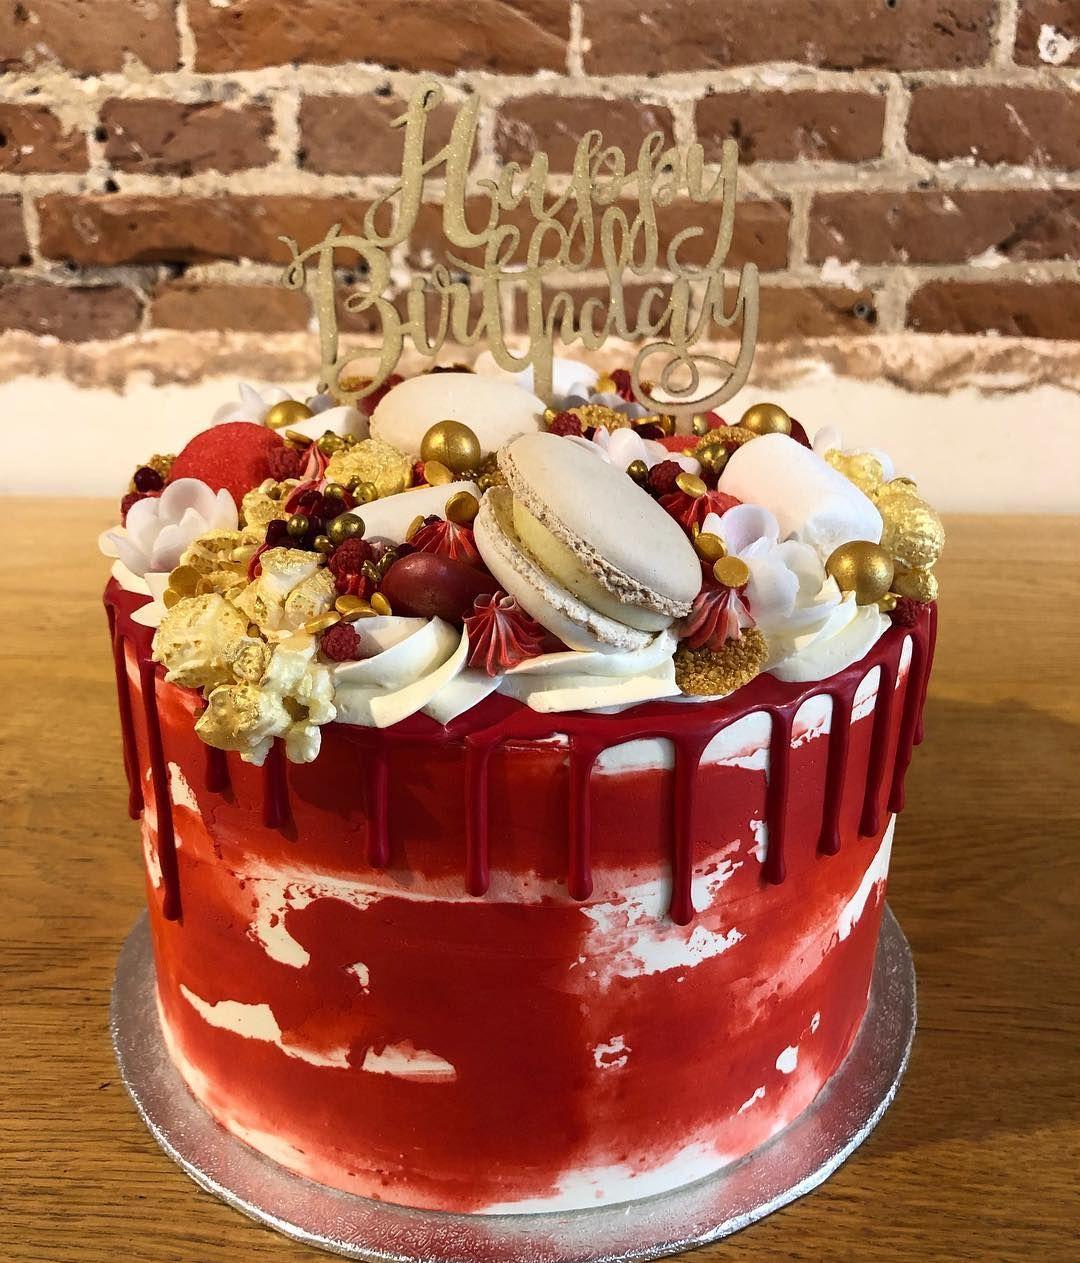 Red And White Birthdaycake Cupalacake Westermarkt